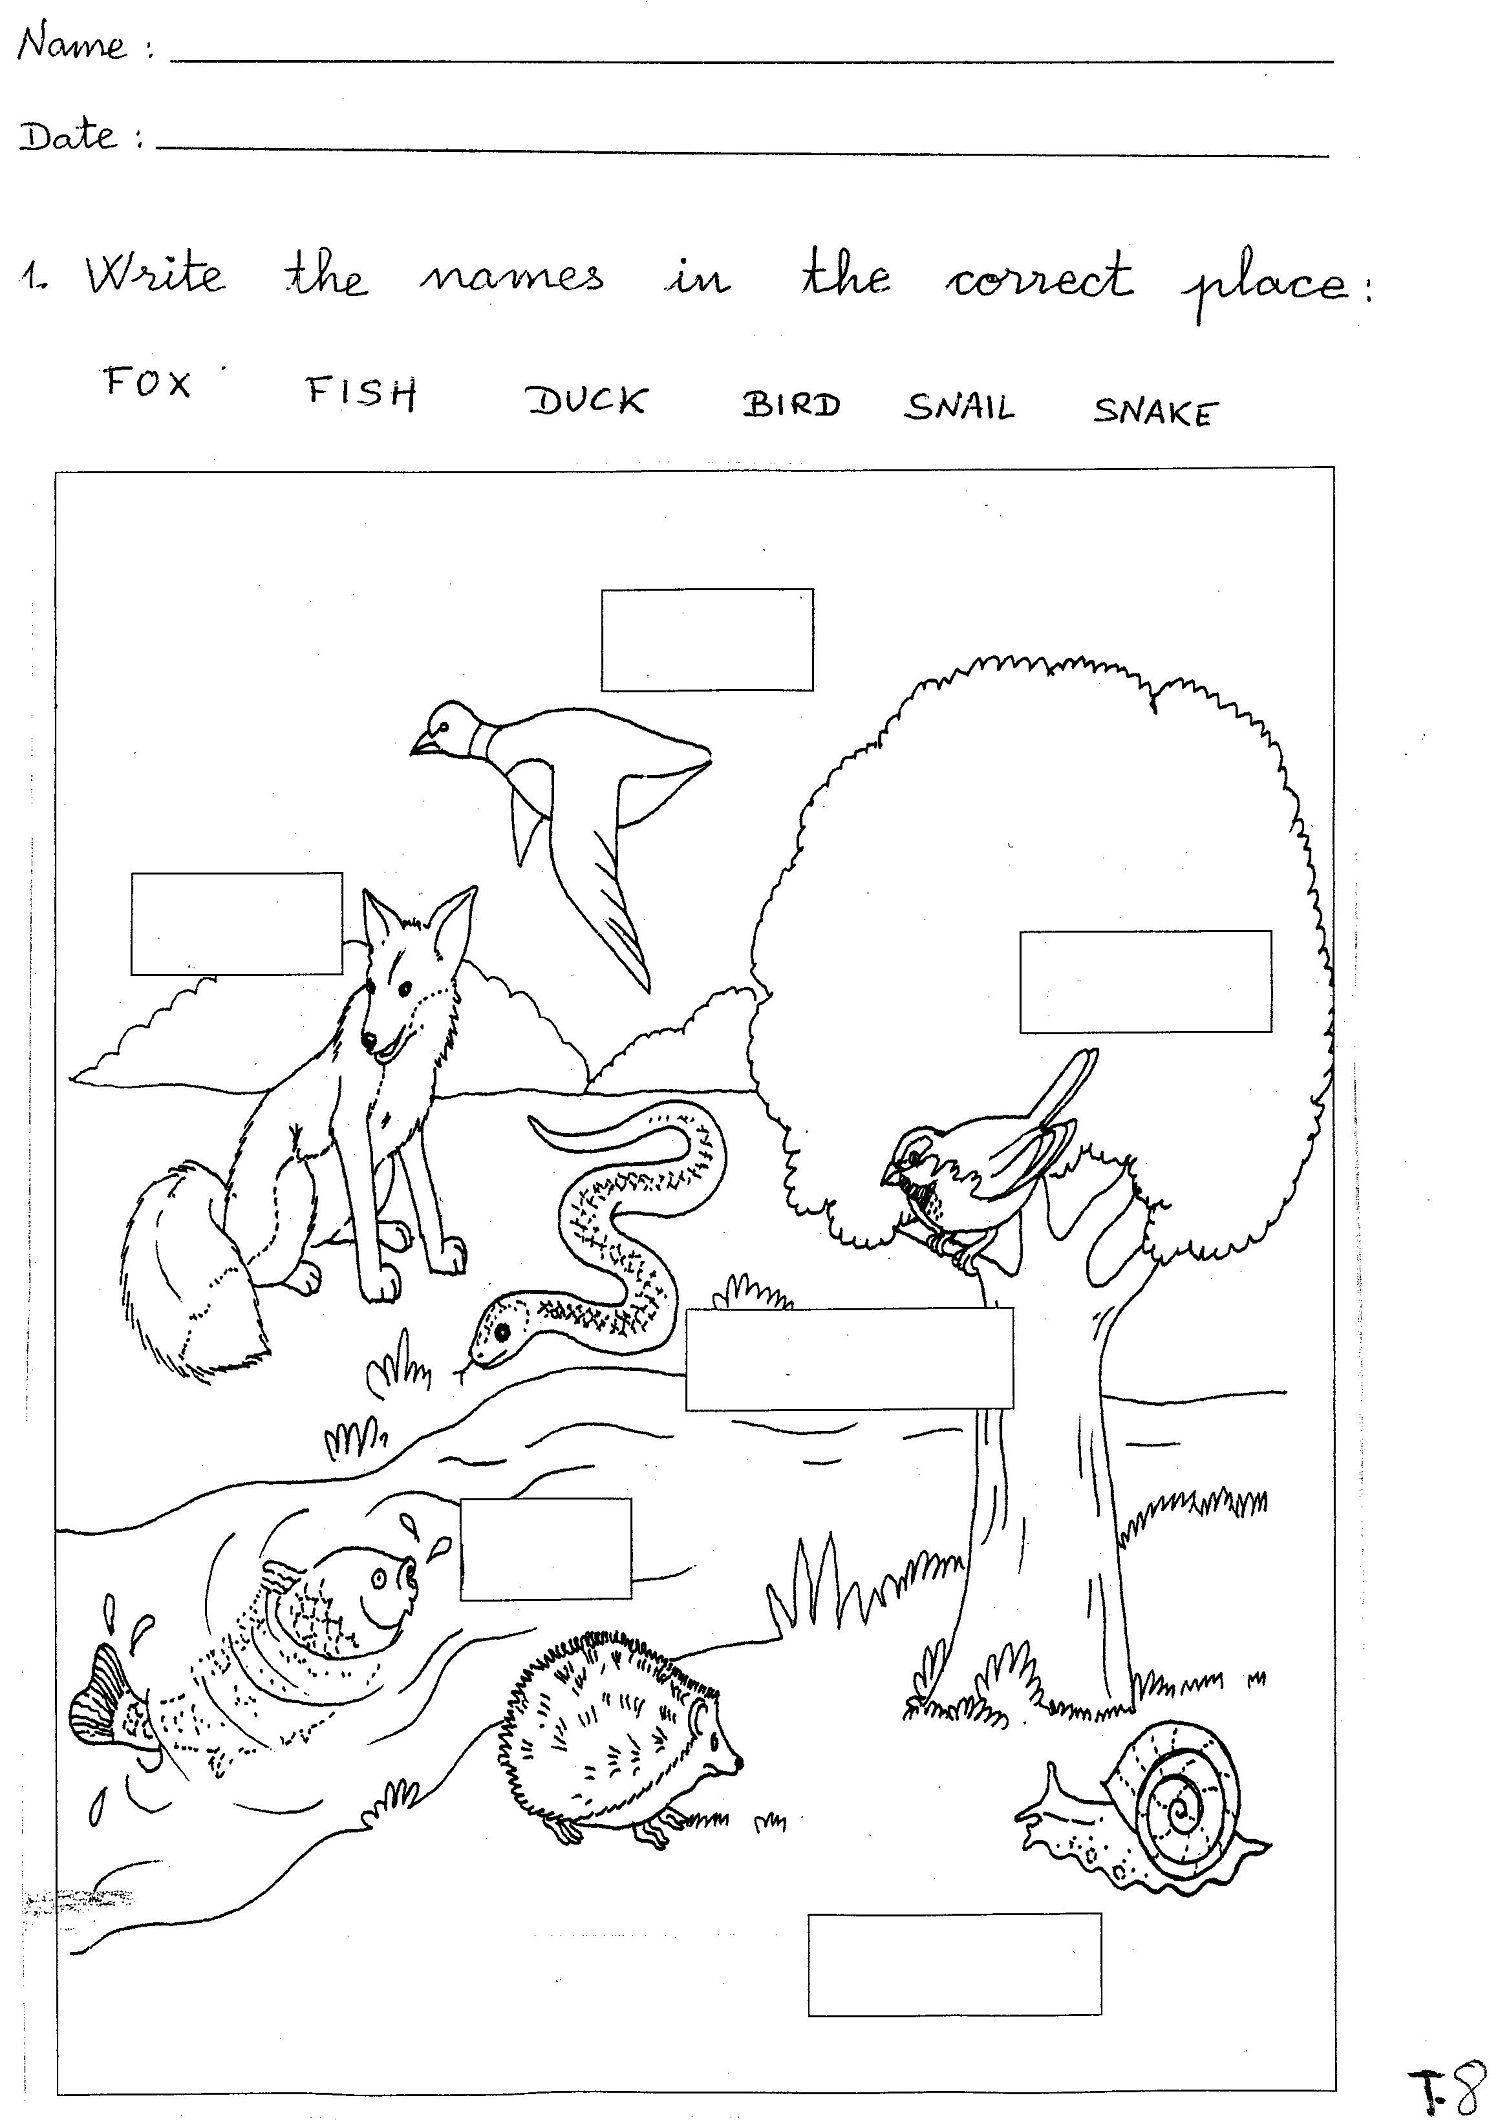 Grade 1 Worksheets for Children Learning Exercise   Biology worksheet [ 2120 x 1500 Pixel ]